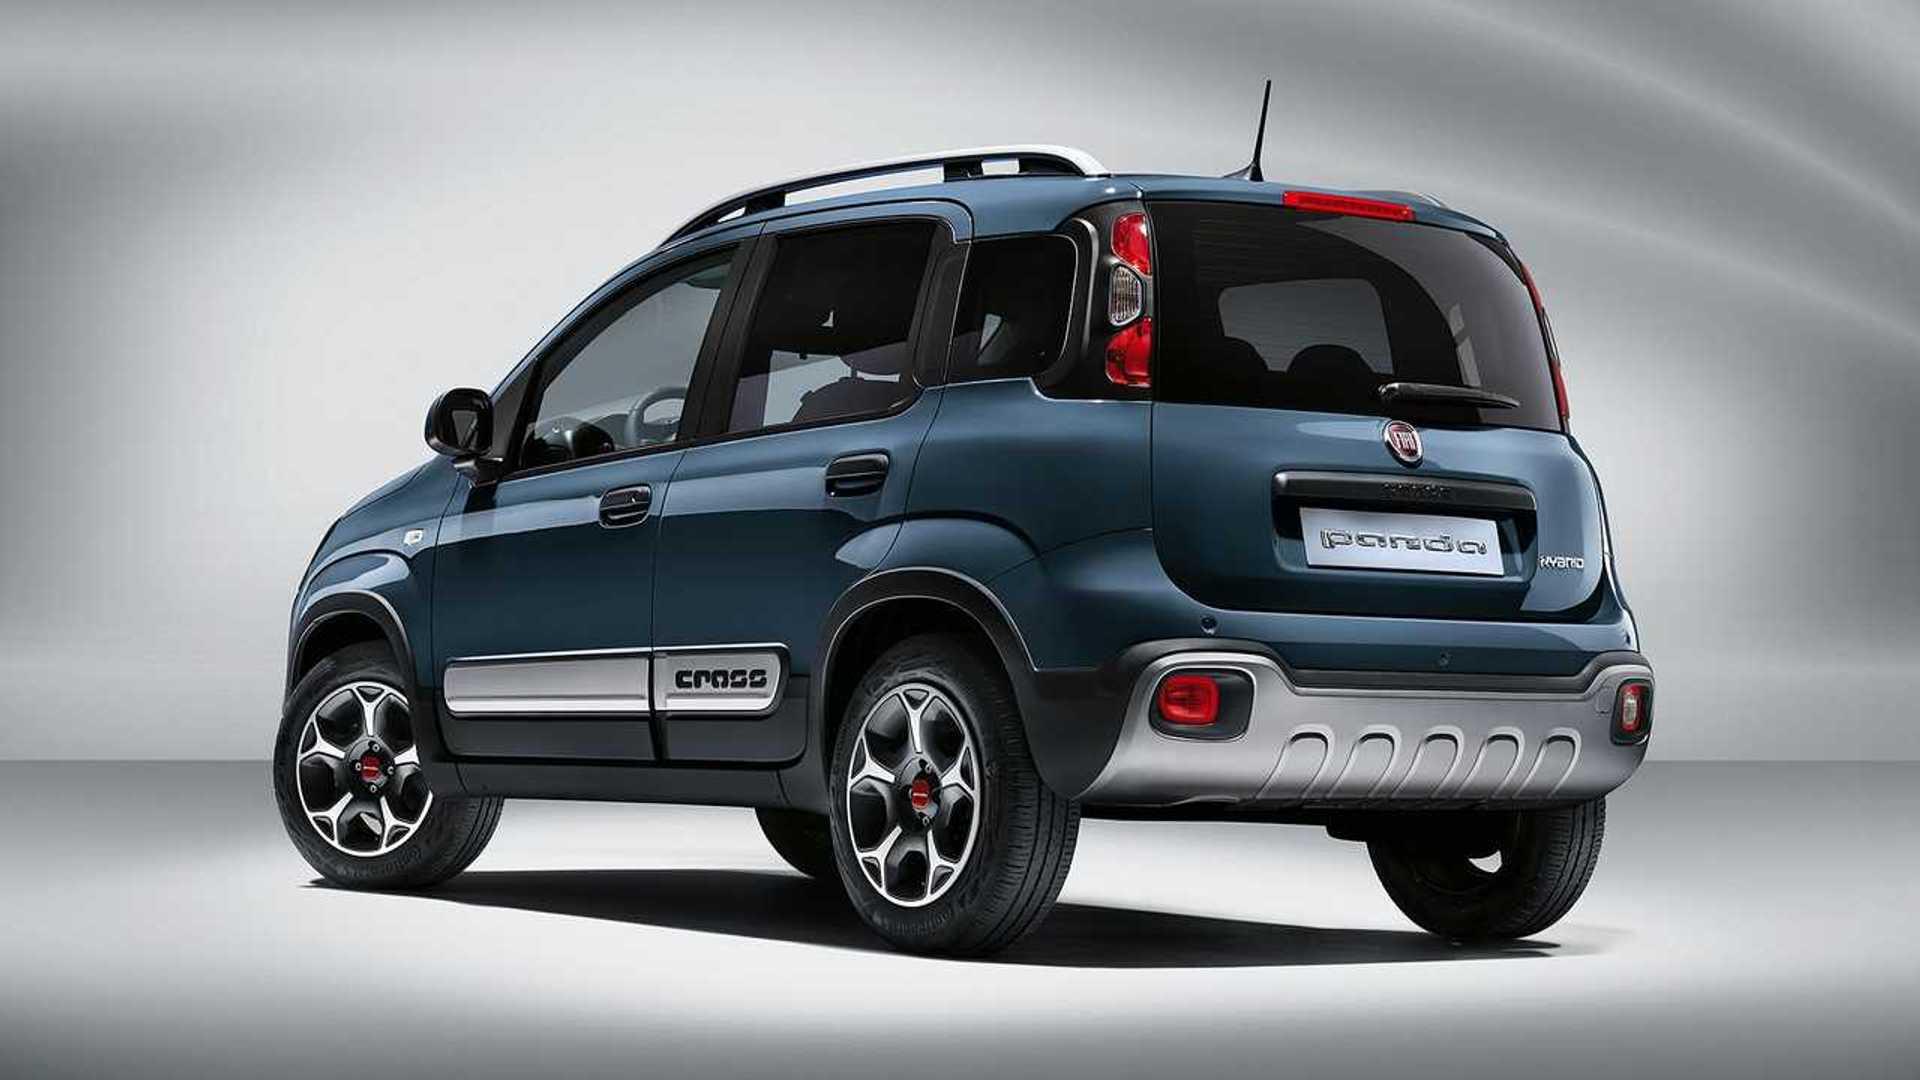 Makyajlı 2021 Fiat Panda, Sport donanımına da kavuştu